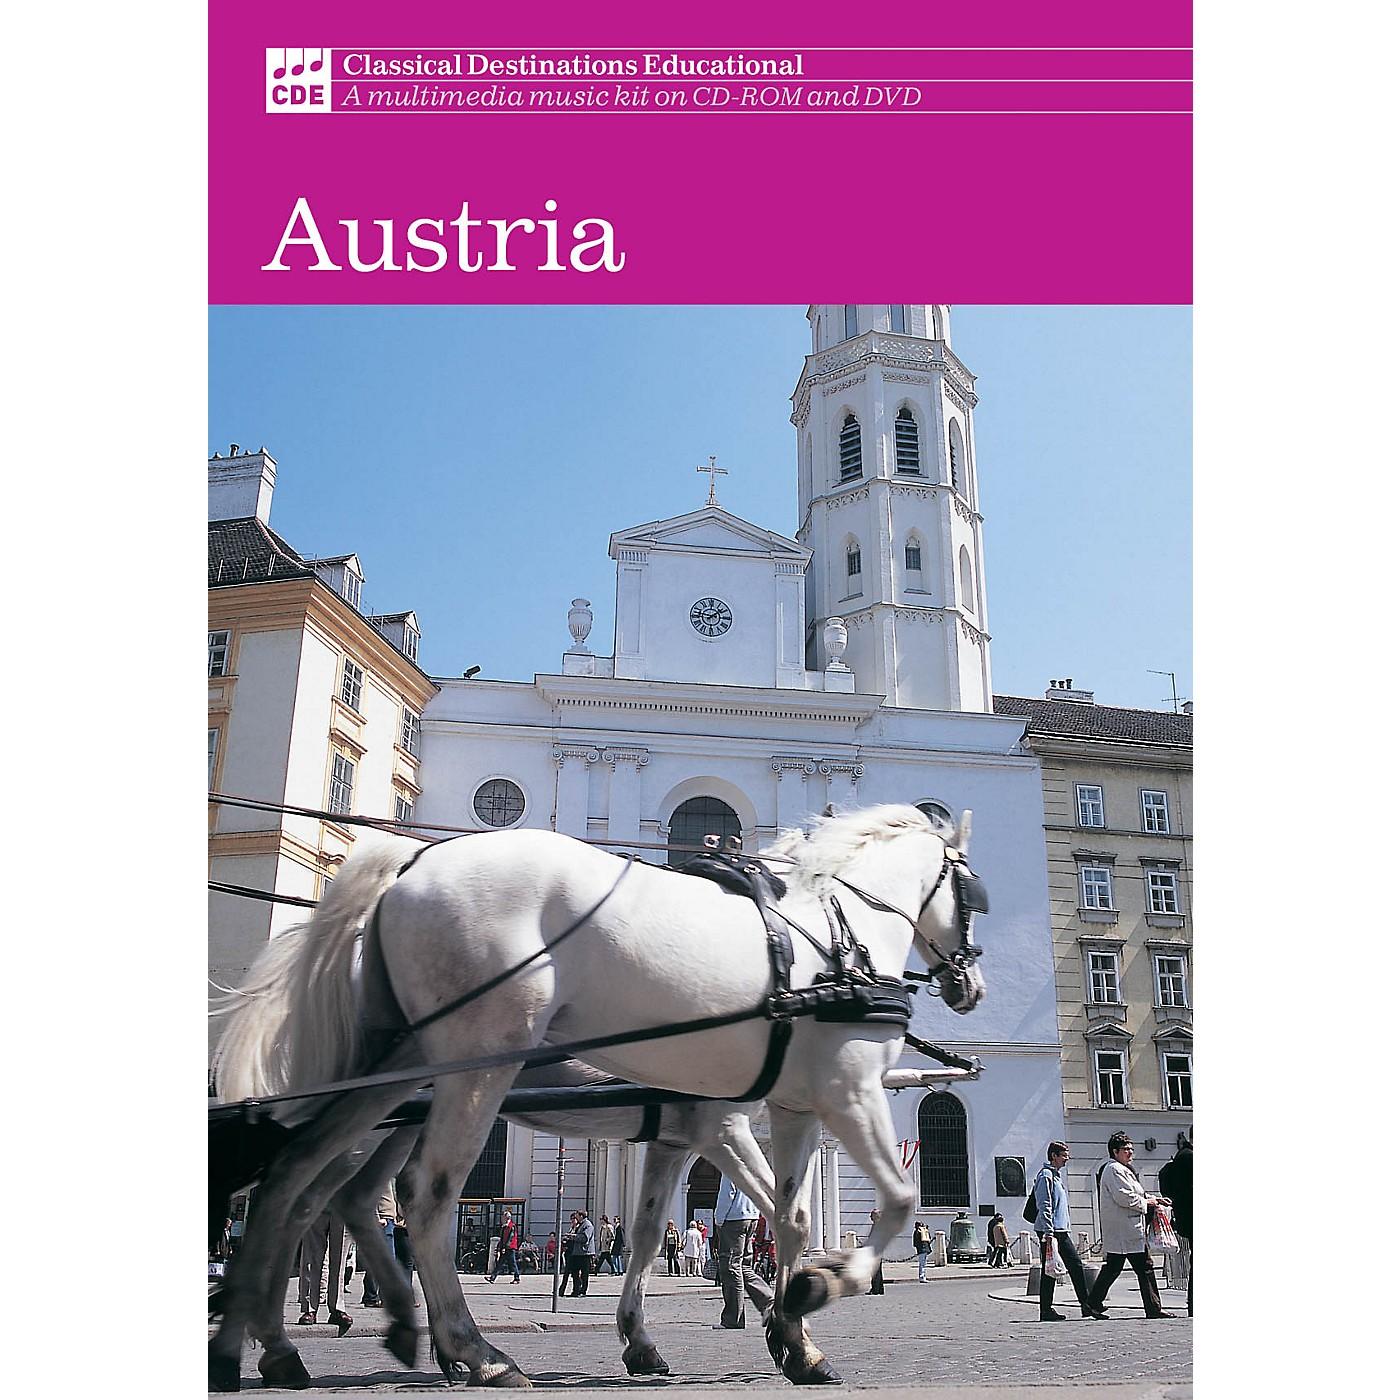 Classical Destinations Educational Classical Destinations: Austria (Austria) DVD thumbnail